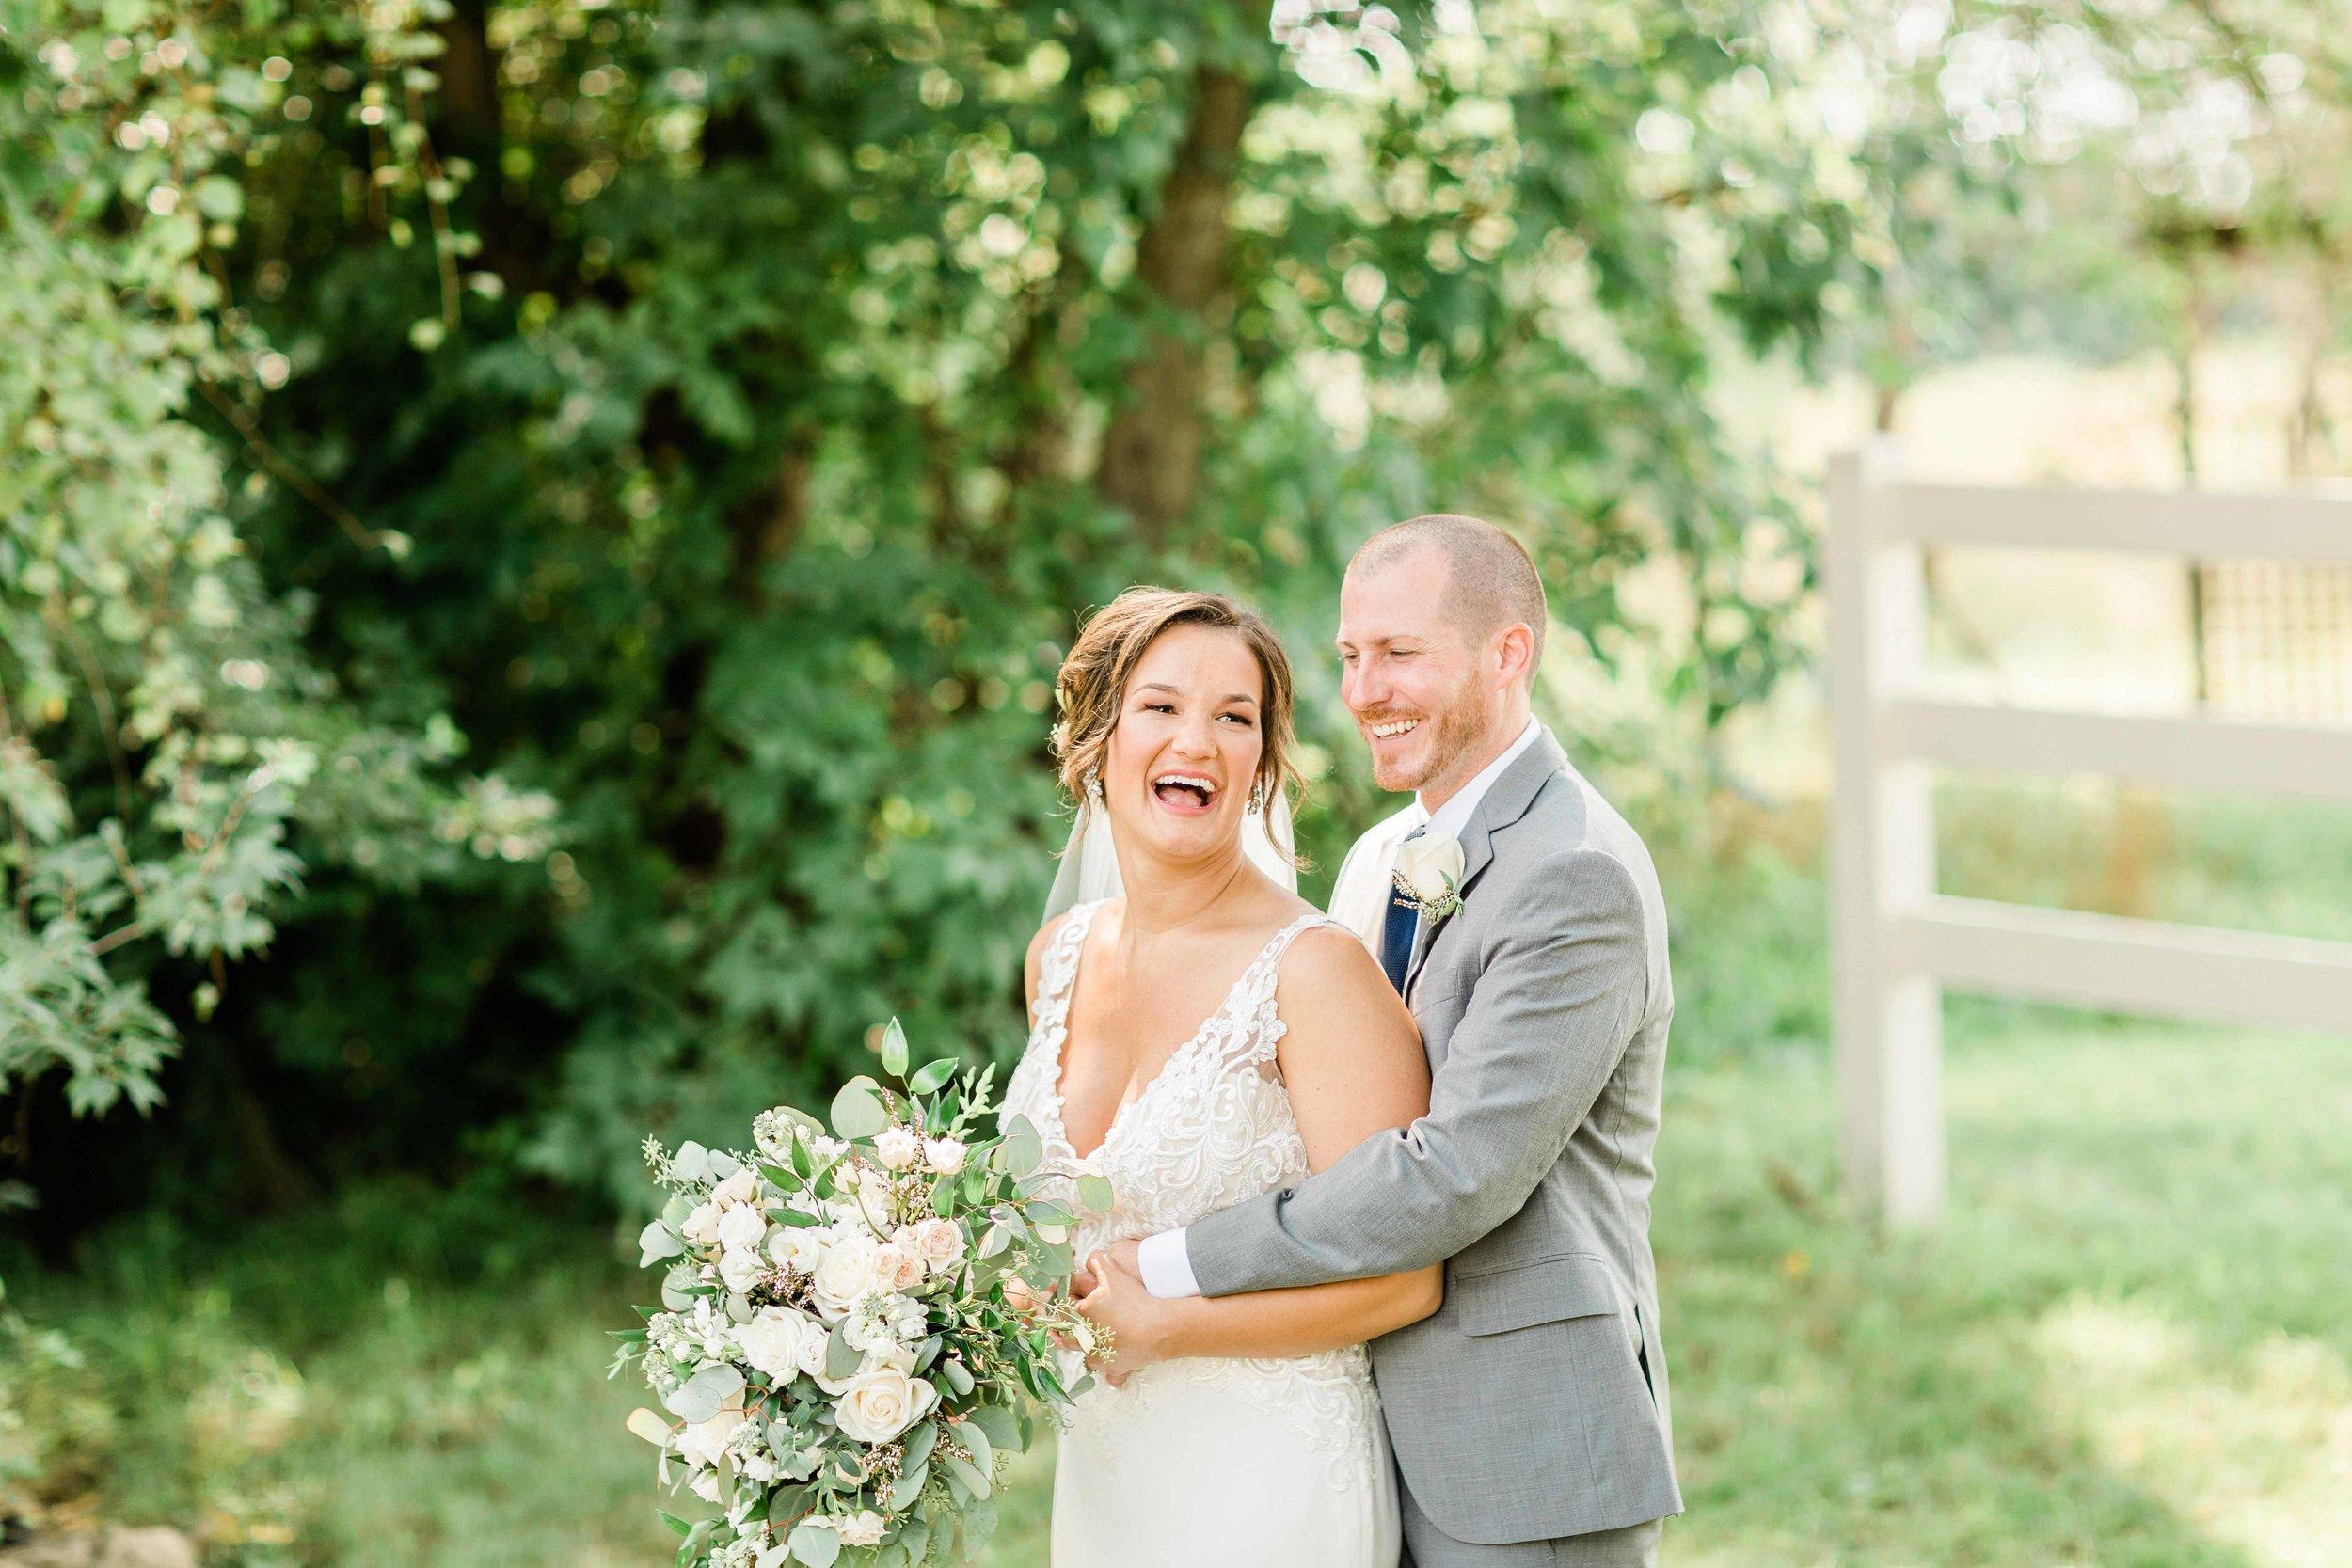 light and airy wedding photographers cincinnati ohio-2.jpg